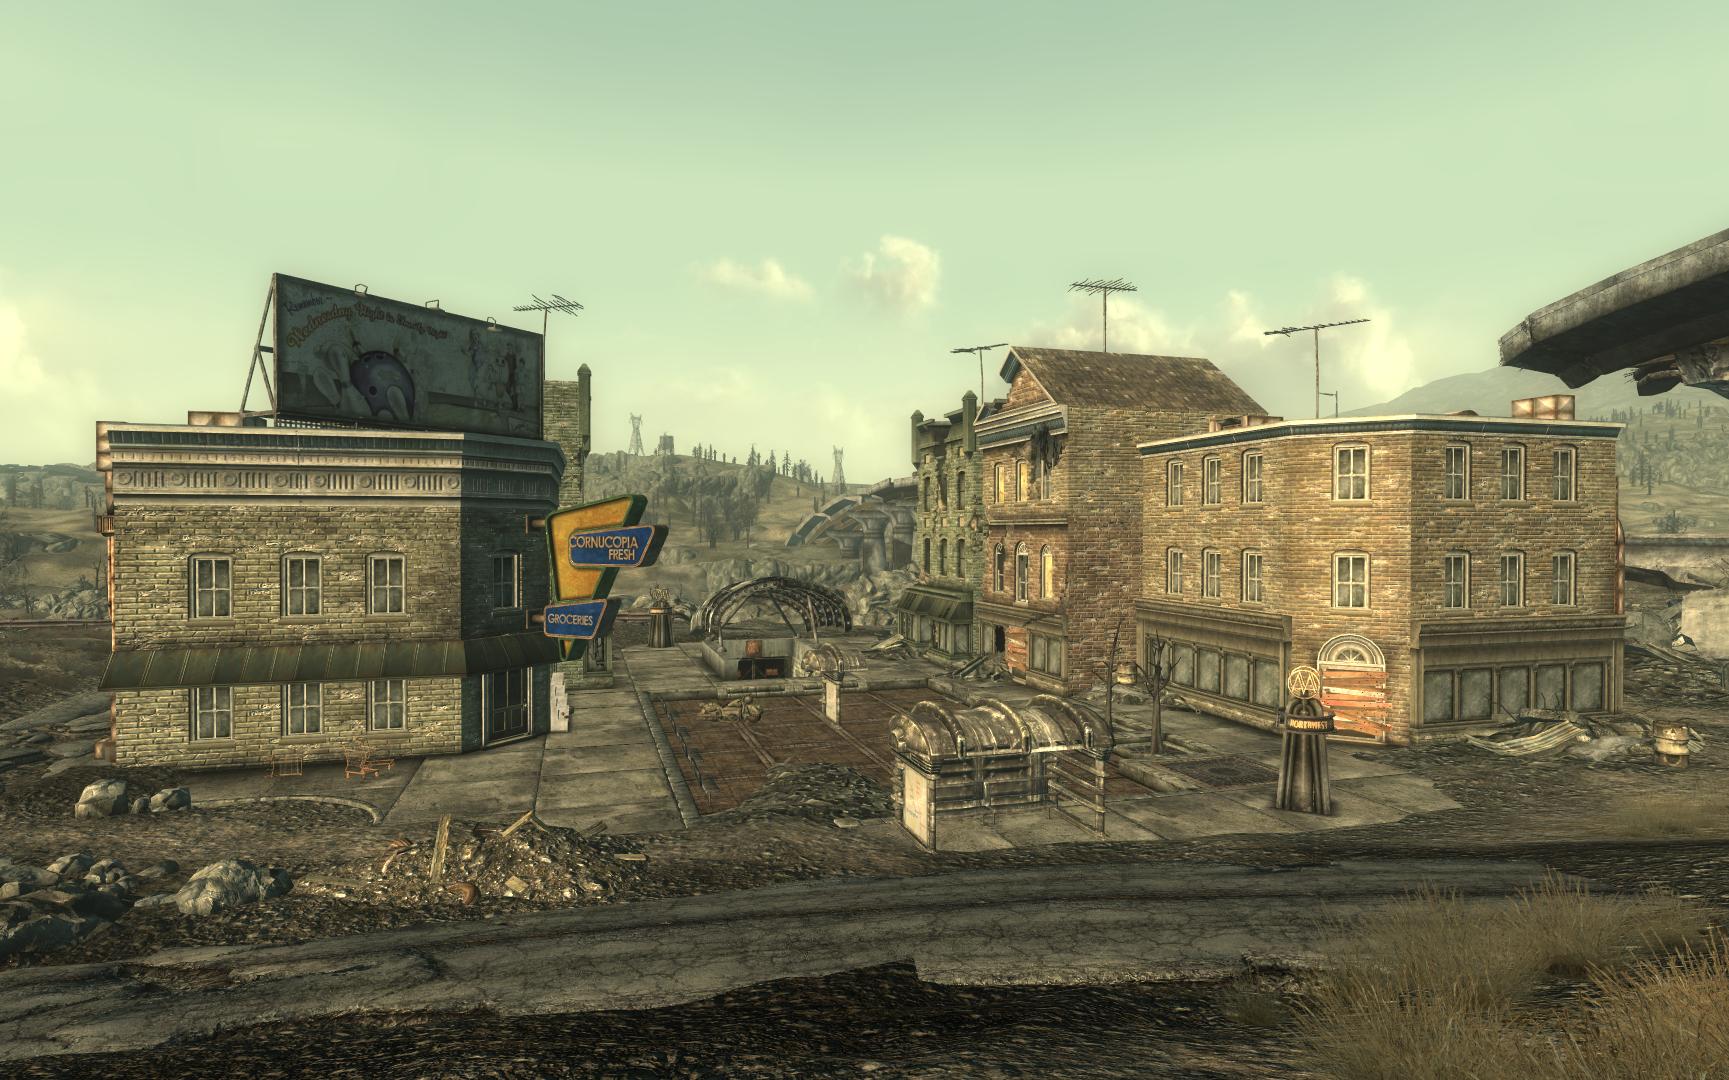 Citaten Seneca Fallout 4 : Northwest seneca station cw fallout wiki fandom